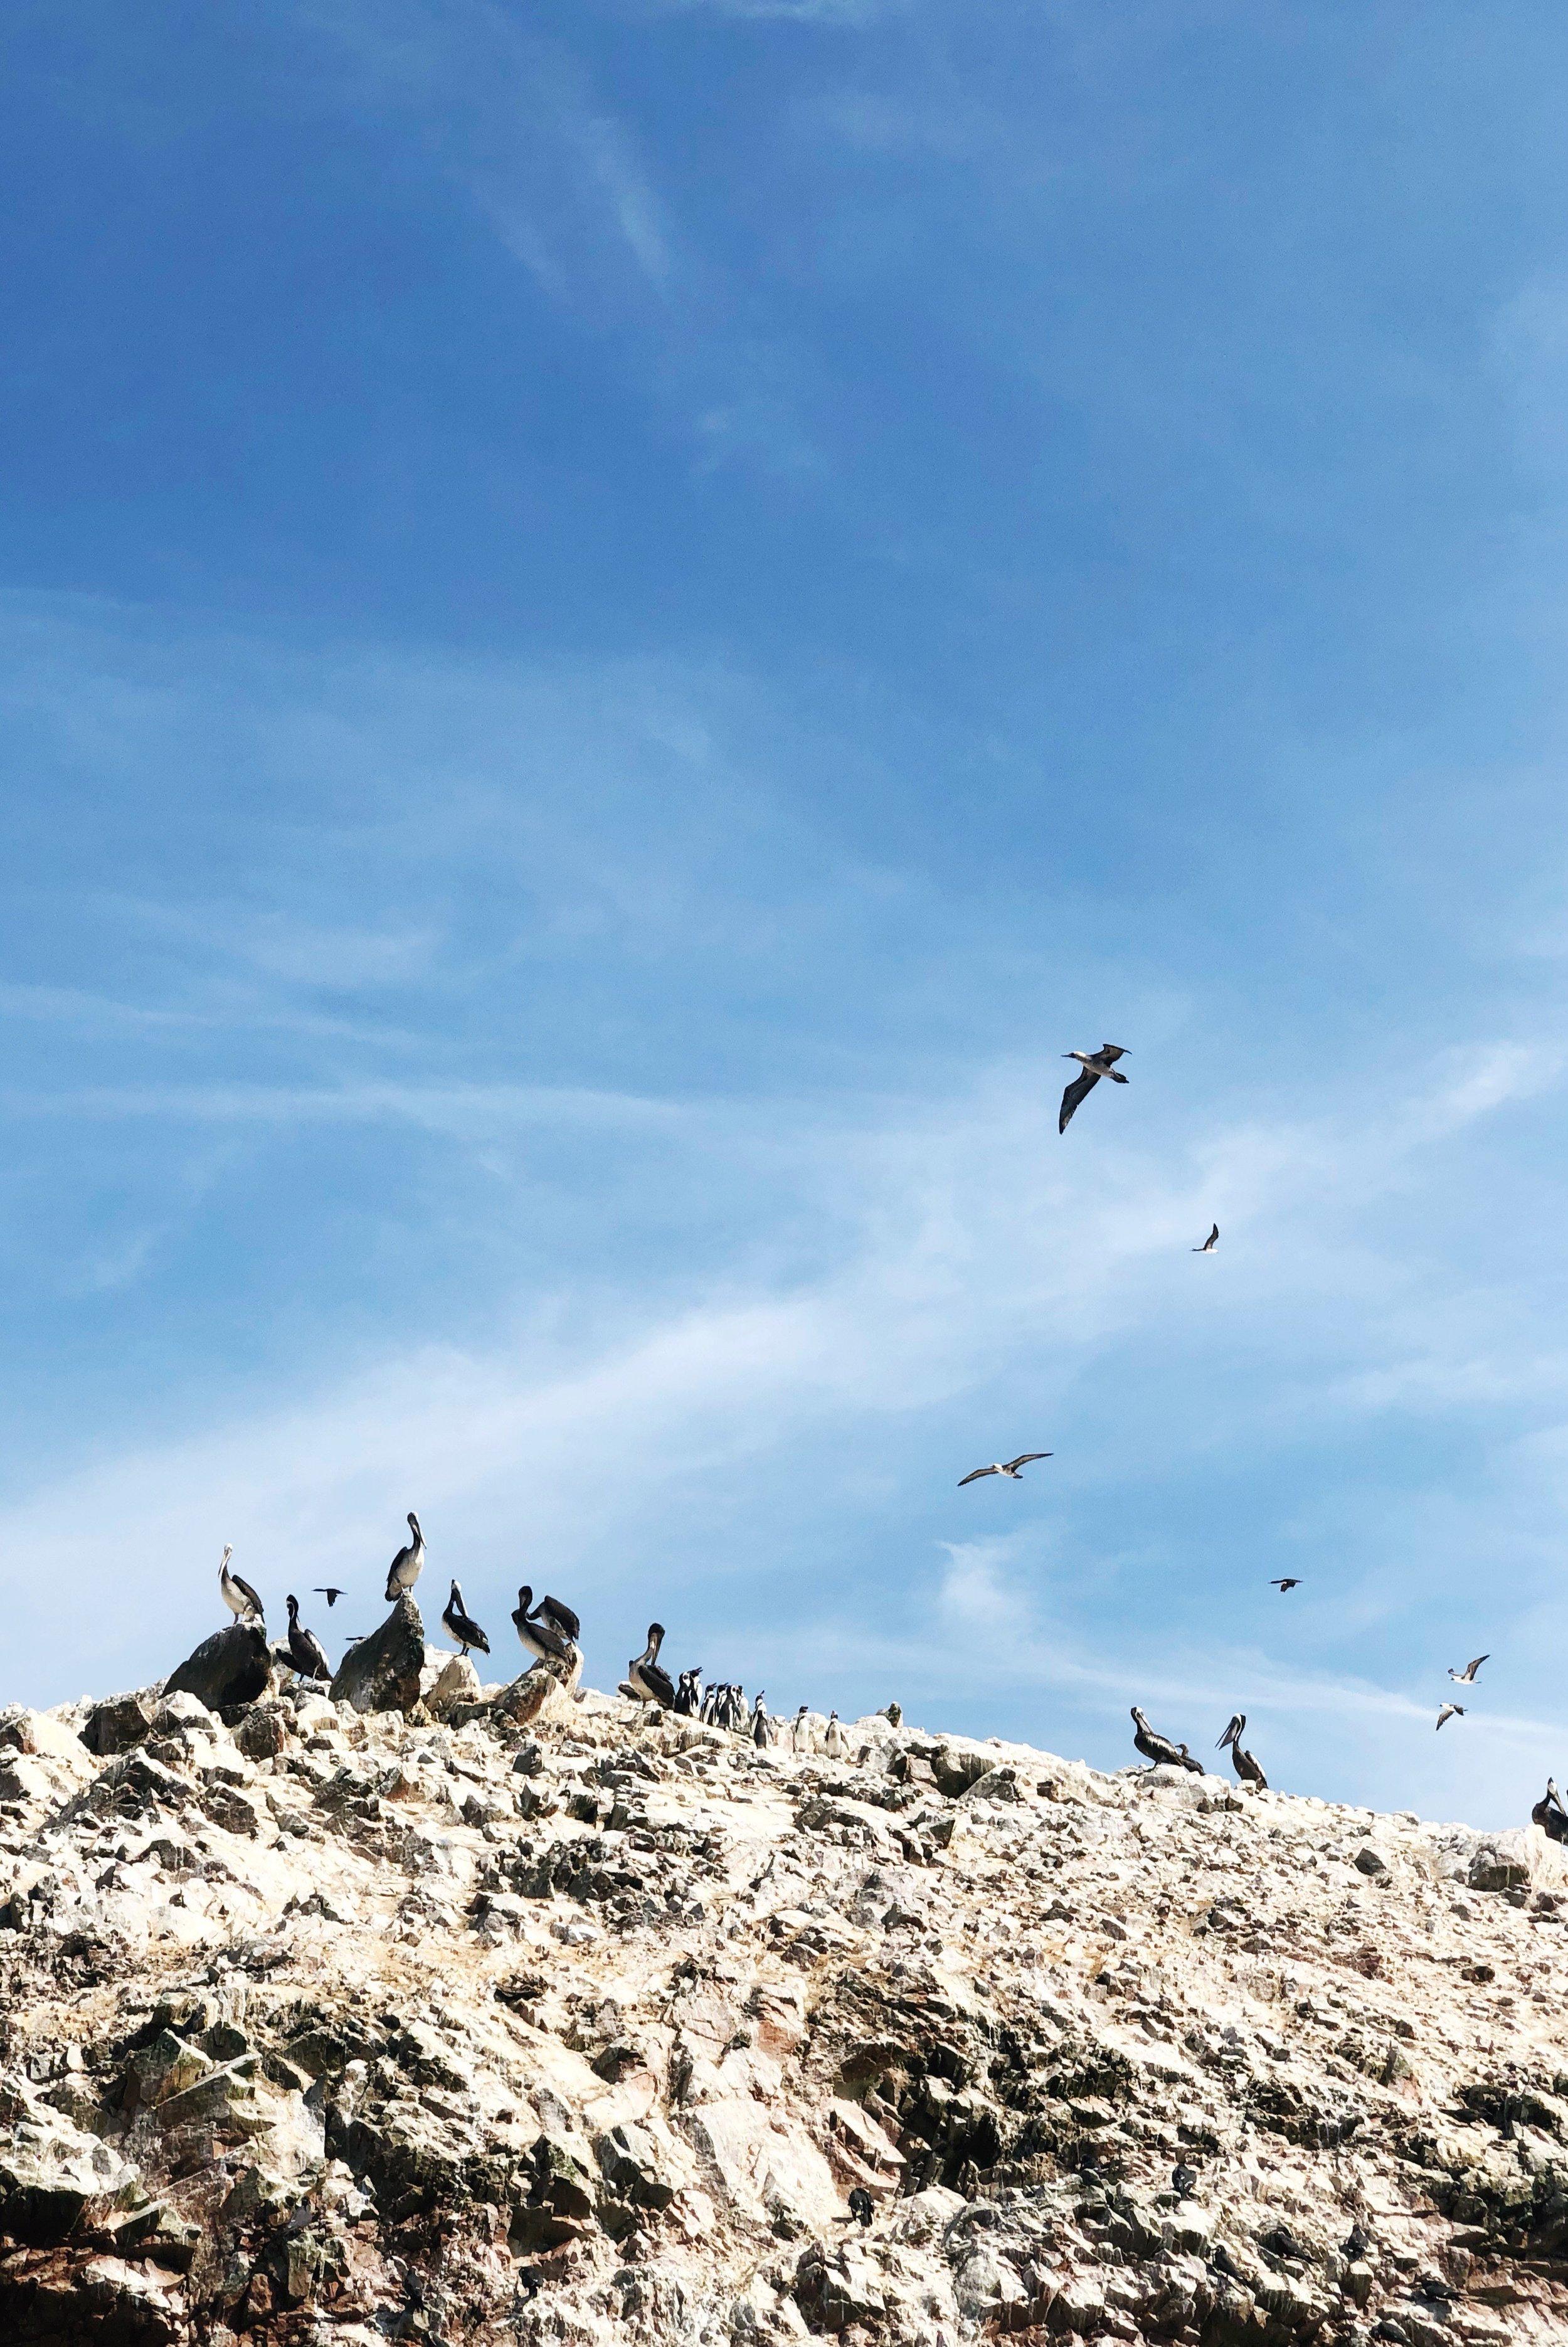 Ballestas Islands - paracas-peru - travel -tips - boat - south america -penguins- sea lions